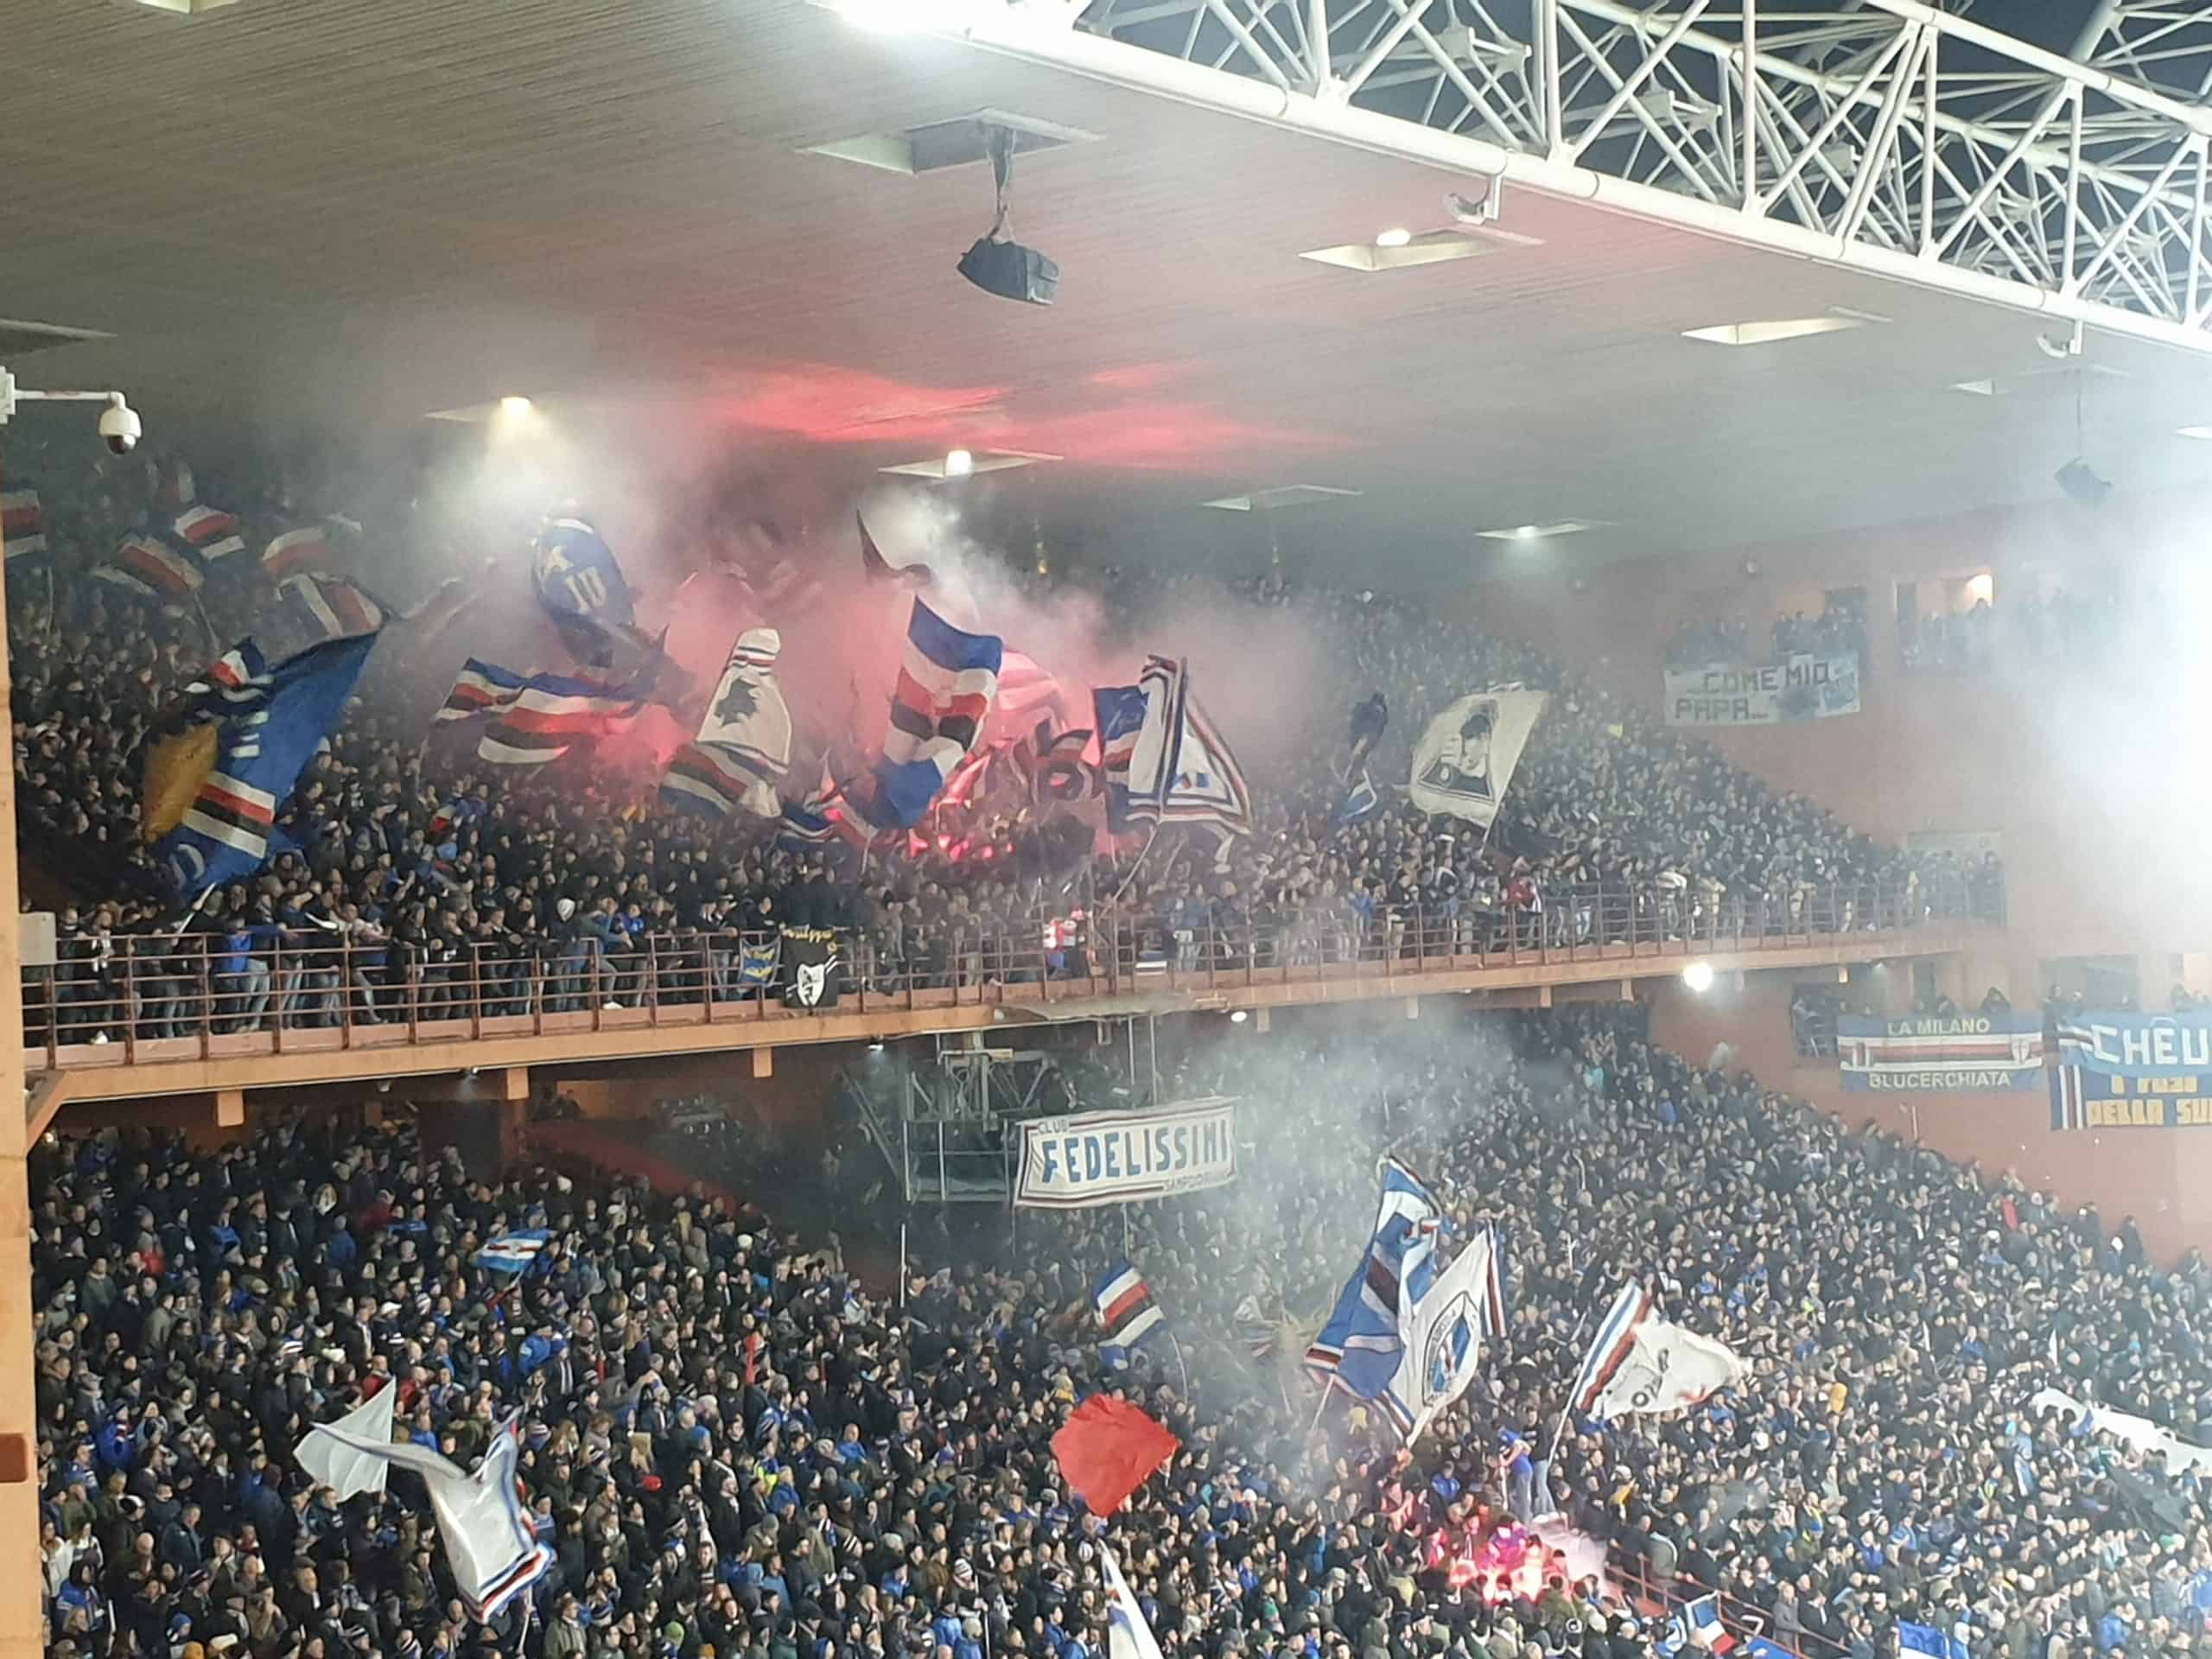 Derby Delle Lanterna: Stadio Luigi Ferraris Sampdoria Fans 2